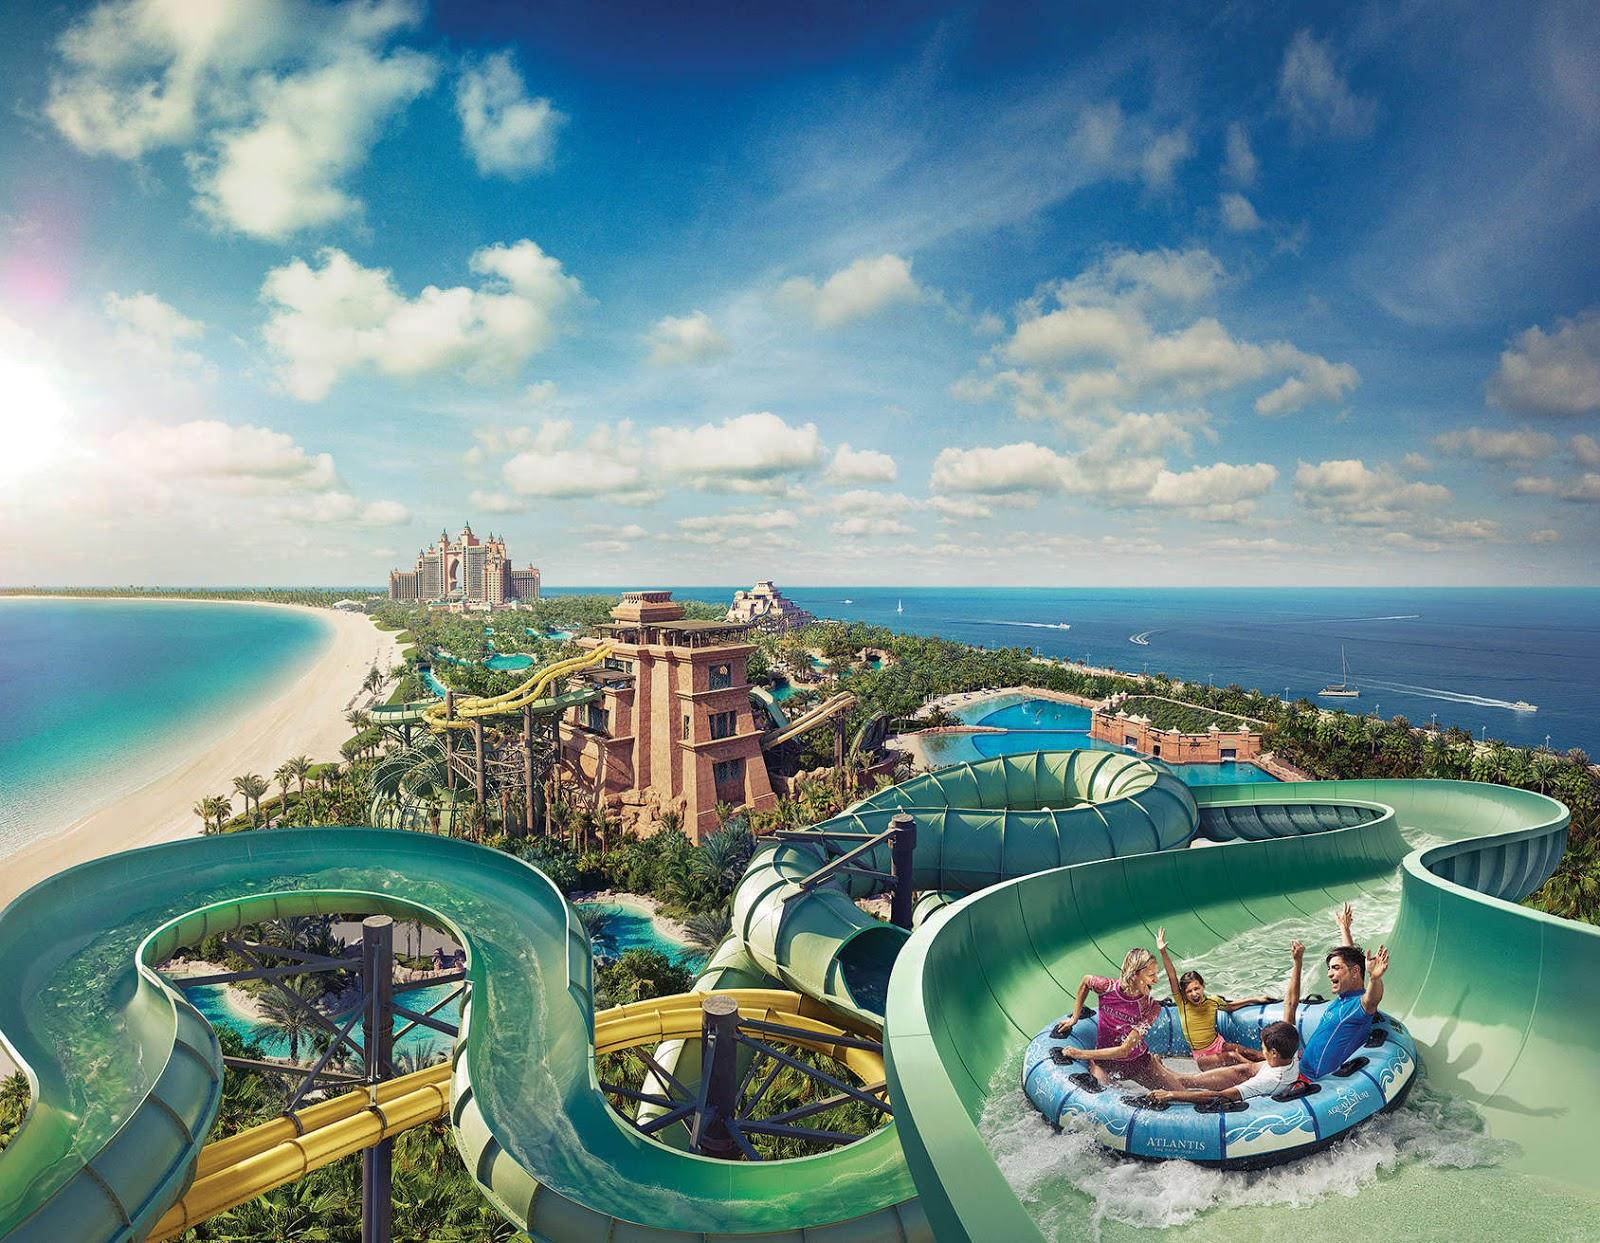 Aquaventure Waterpark Dubai All Culture Miscellaneous Hotels Resorts Humor